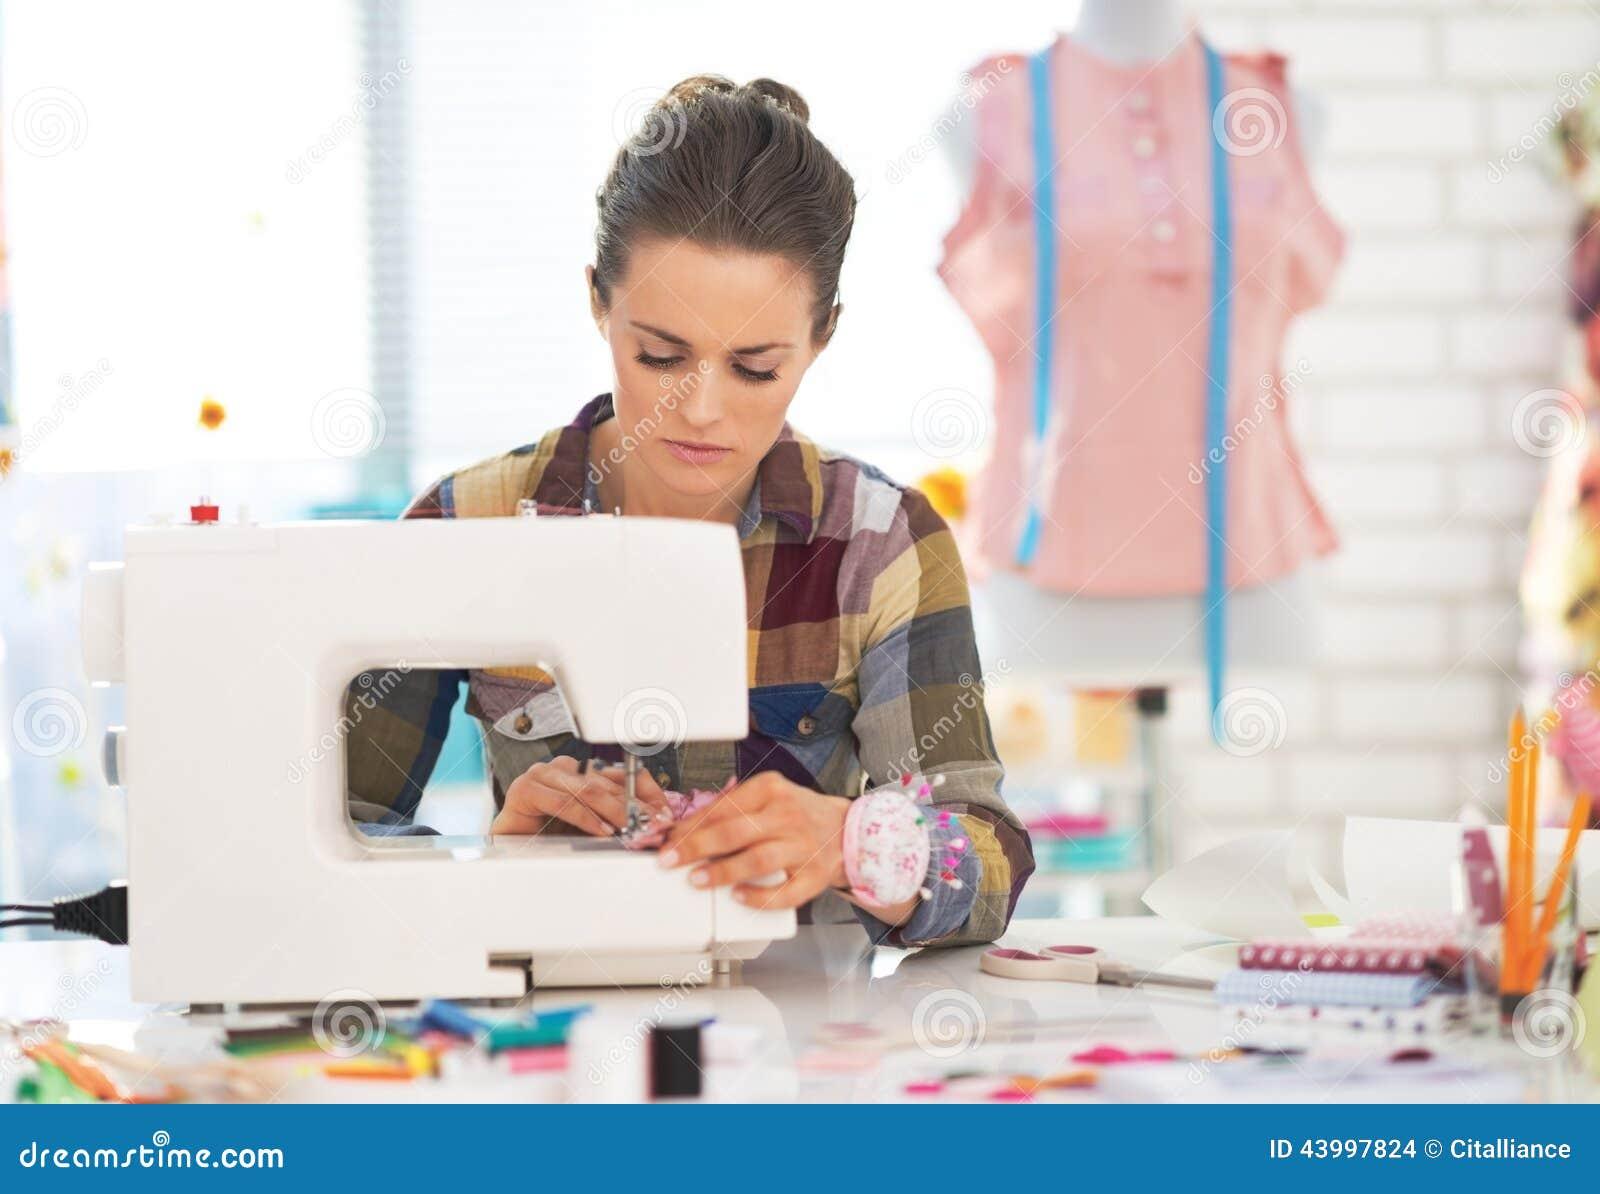 Modern dressmaker buttons - Dressmaker Woman Working With Sewing Machine